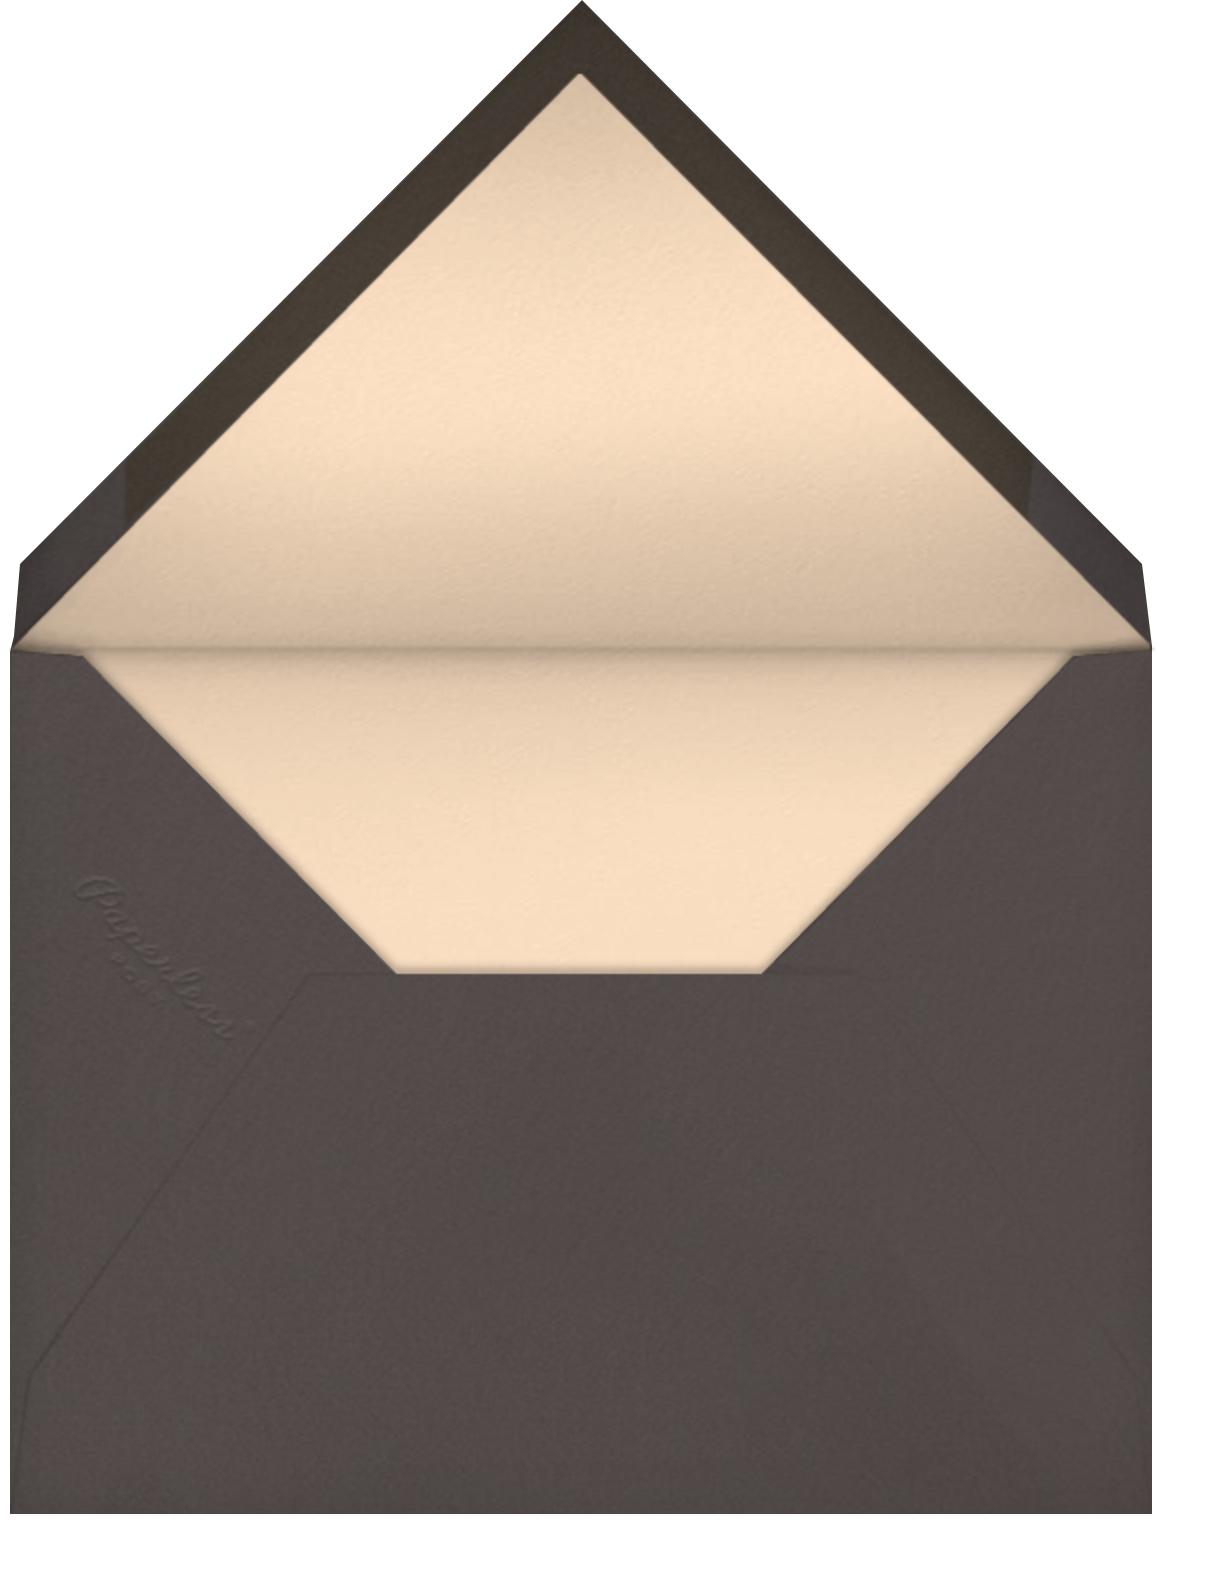 Mr. Bear (Meg Hunt) - Red Cap Cards - Envelope